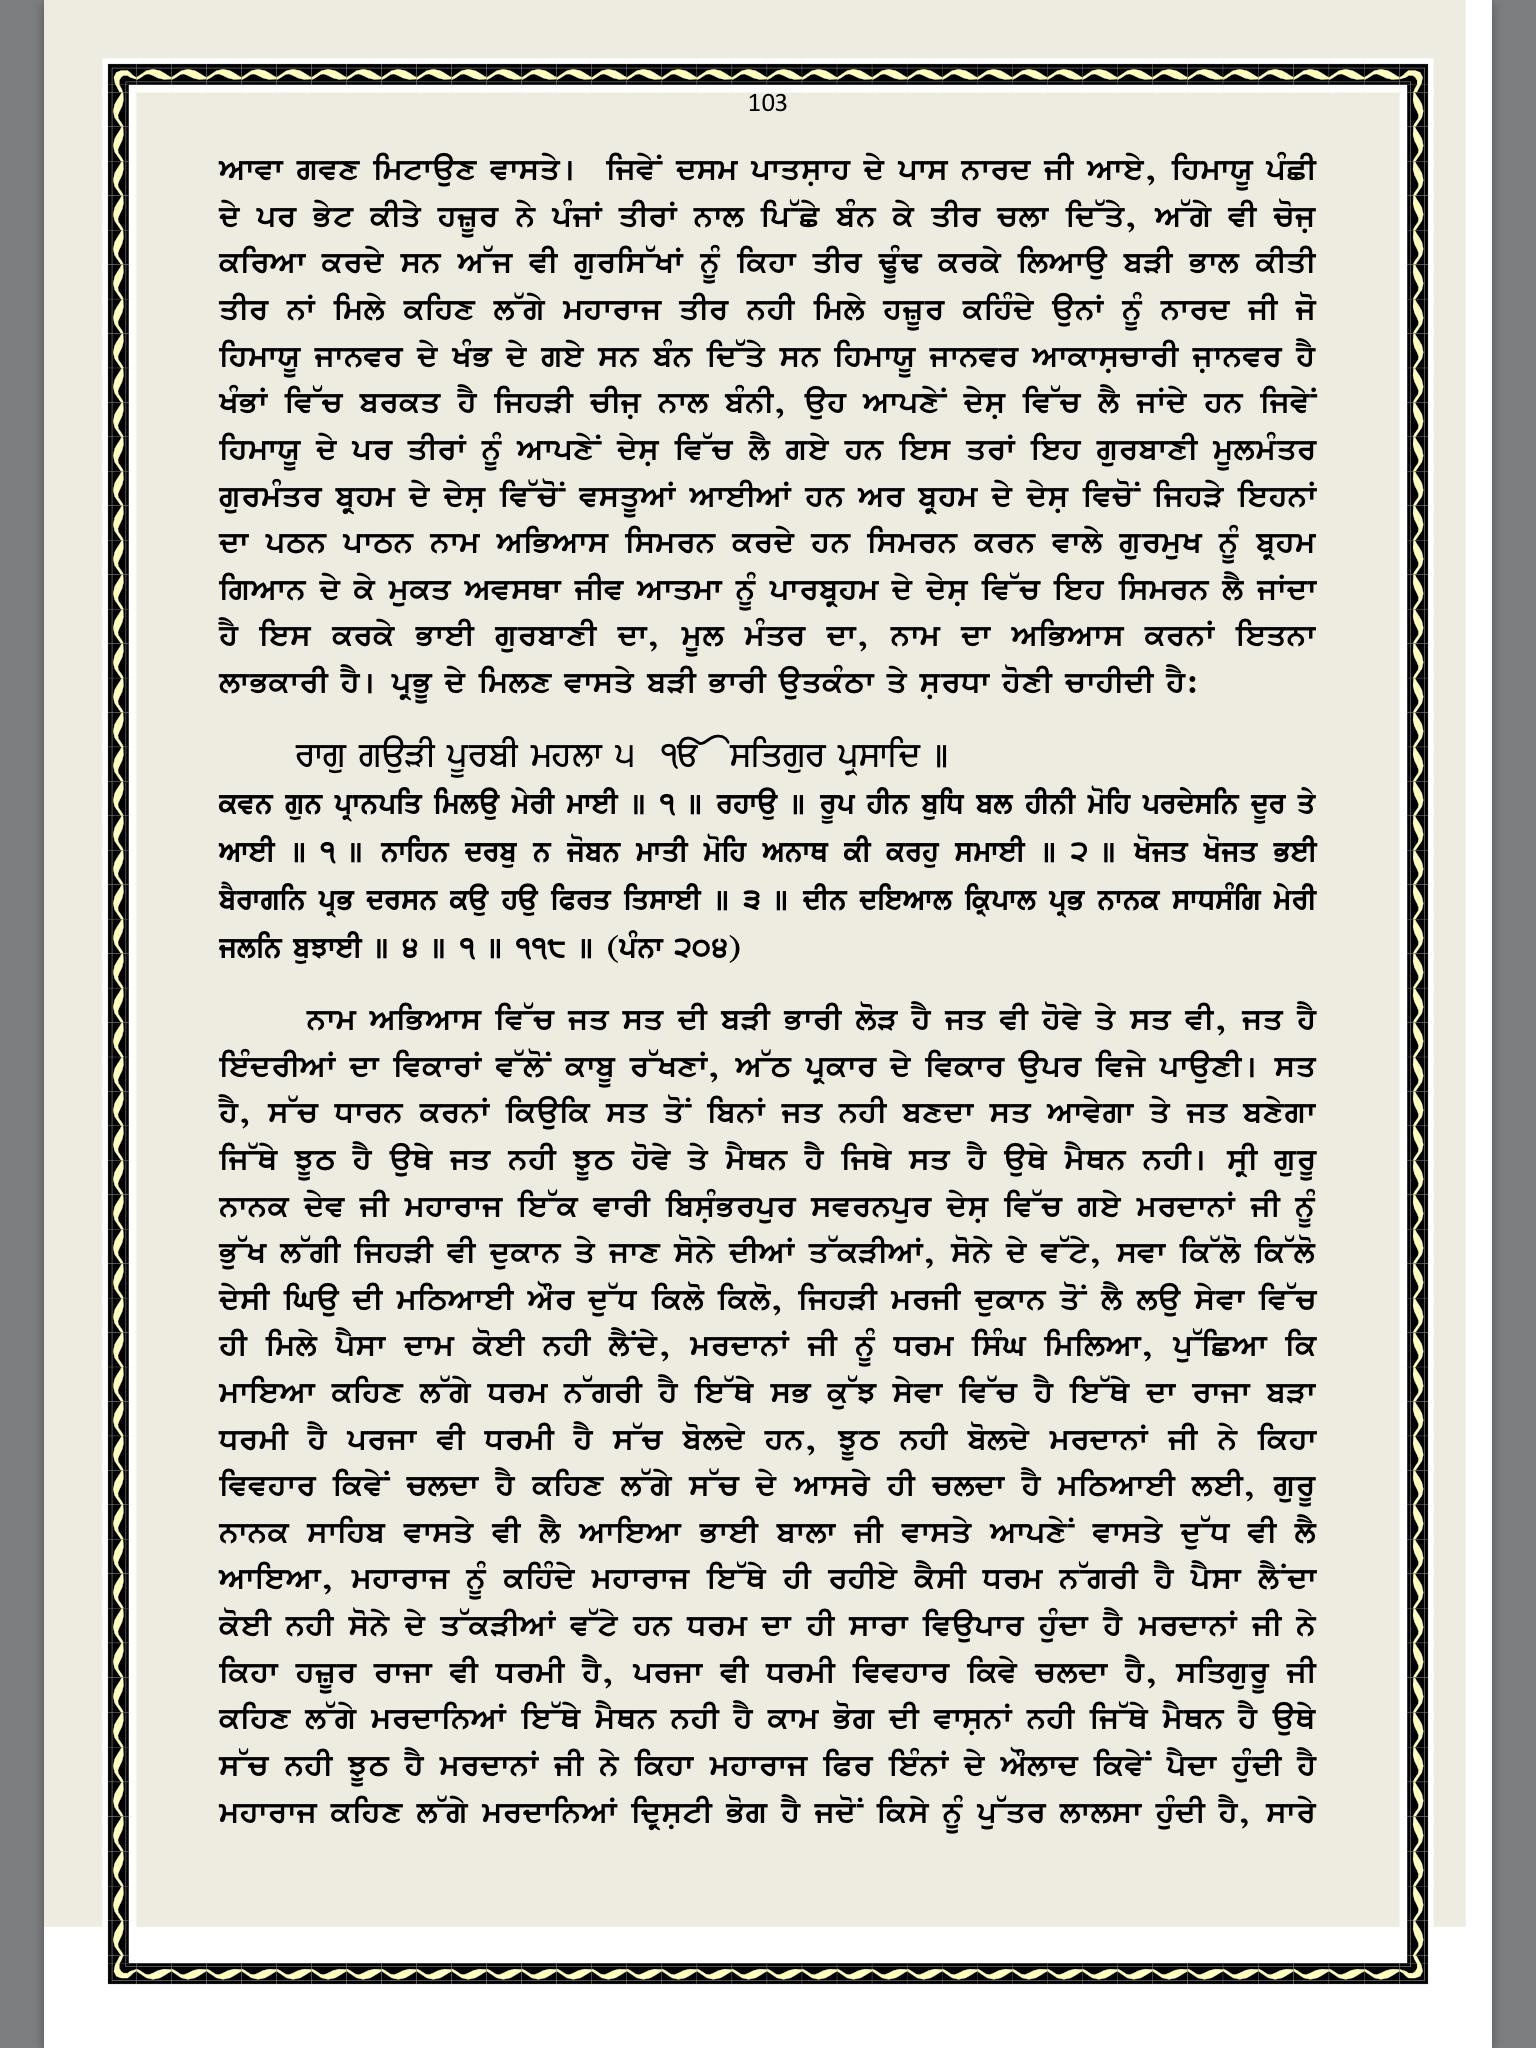 Guru hargobind sahib ji wife sexual dysfunction